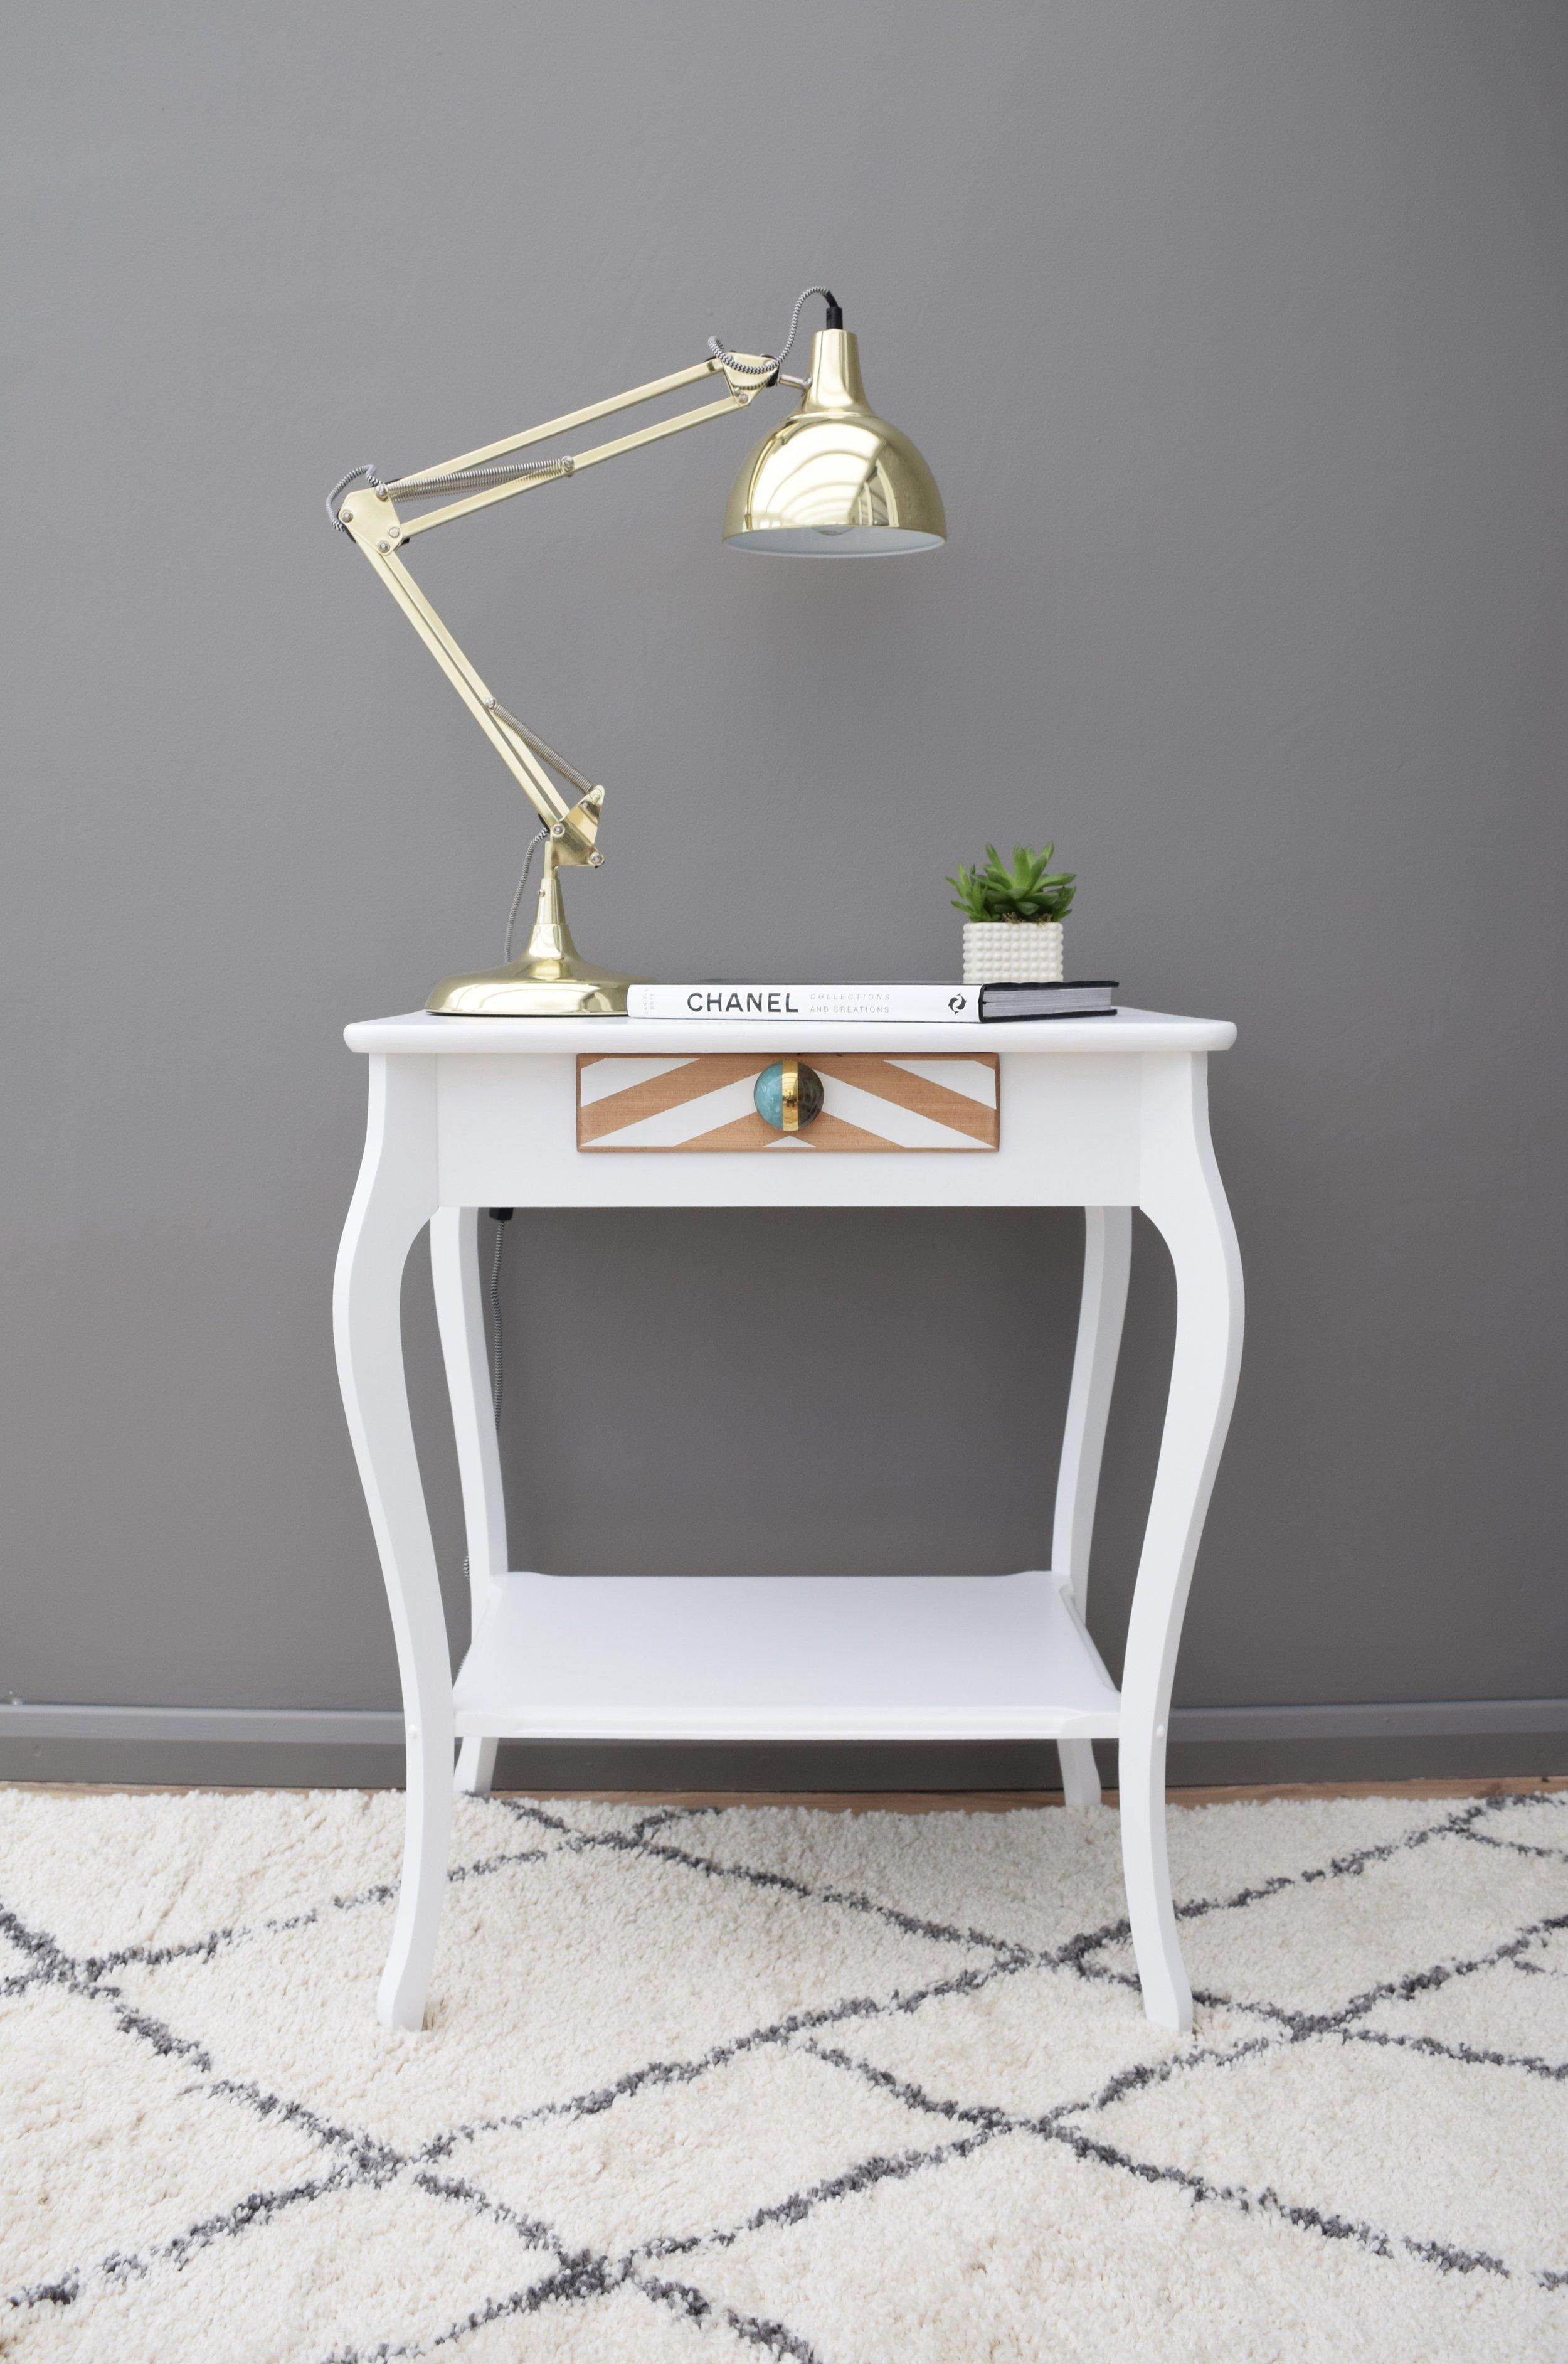 VINTAGE OAK TABLE IN WHITE WITH CHEVRON DESIGN